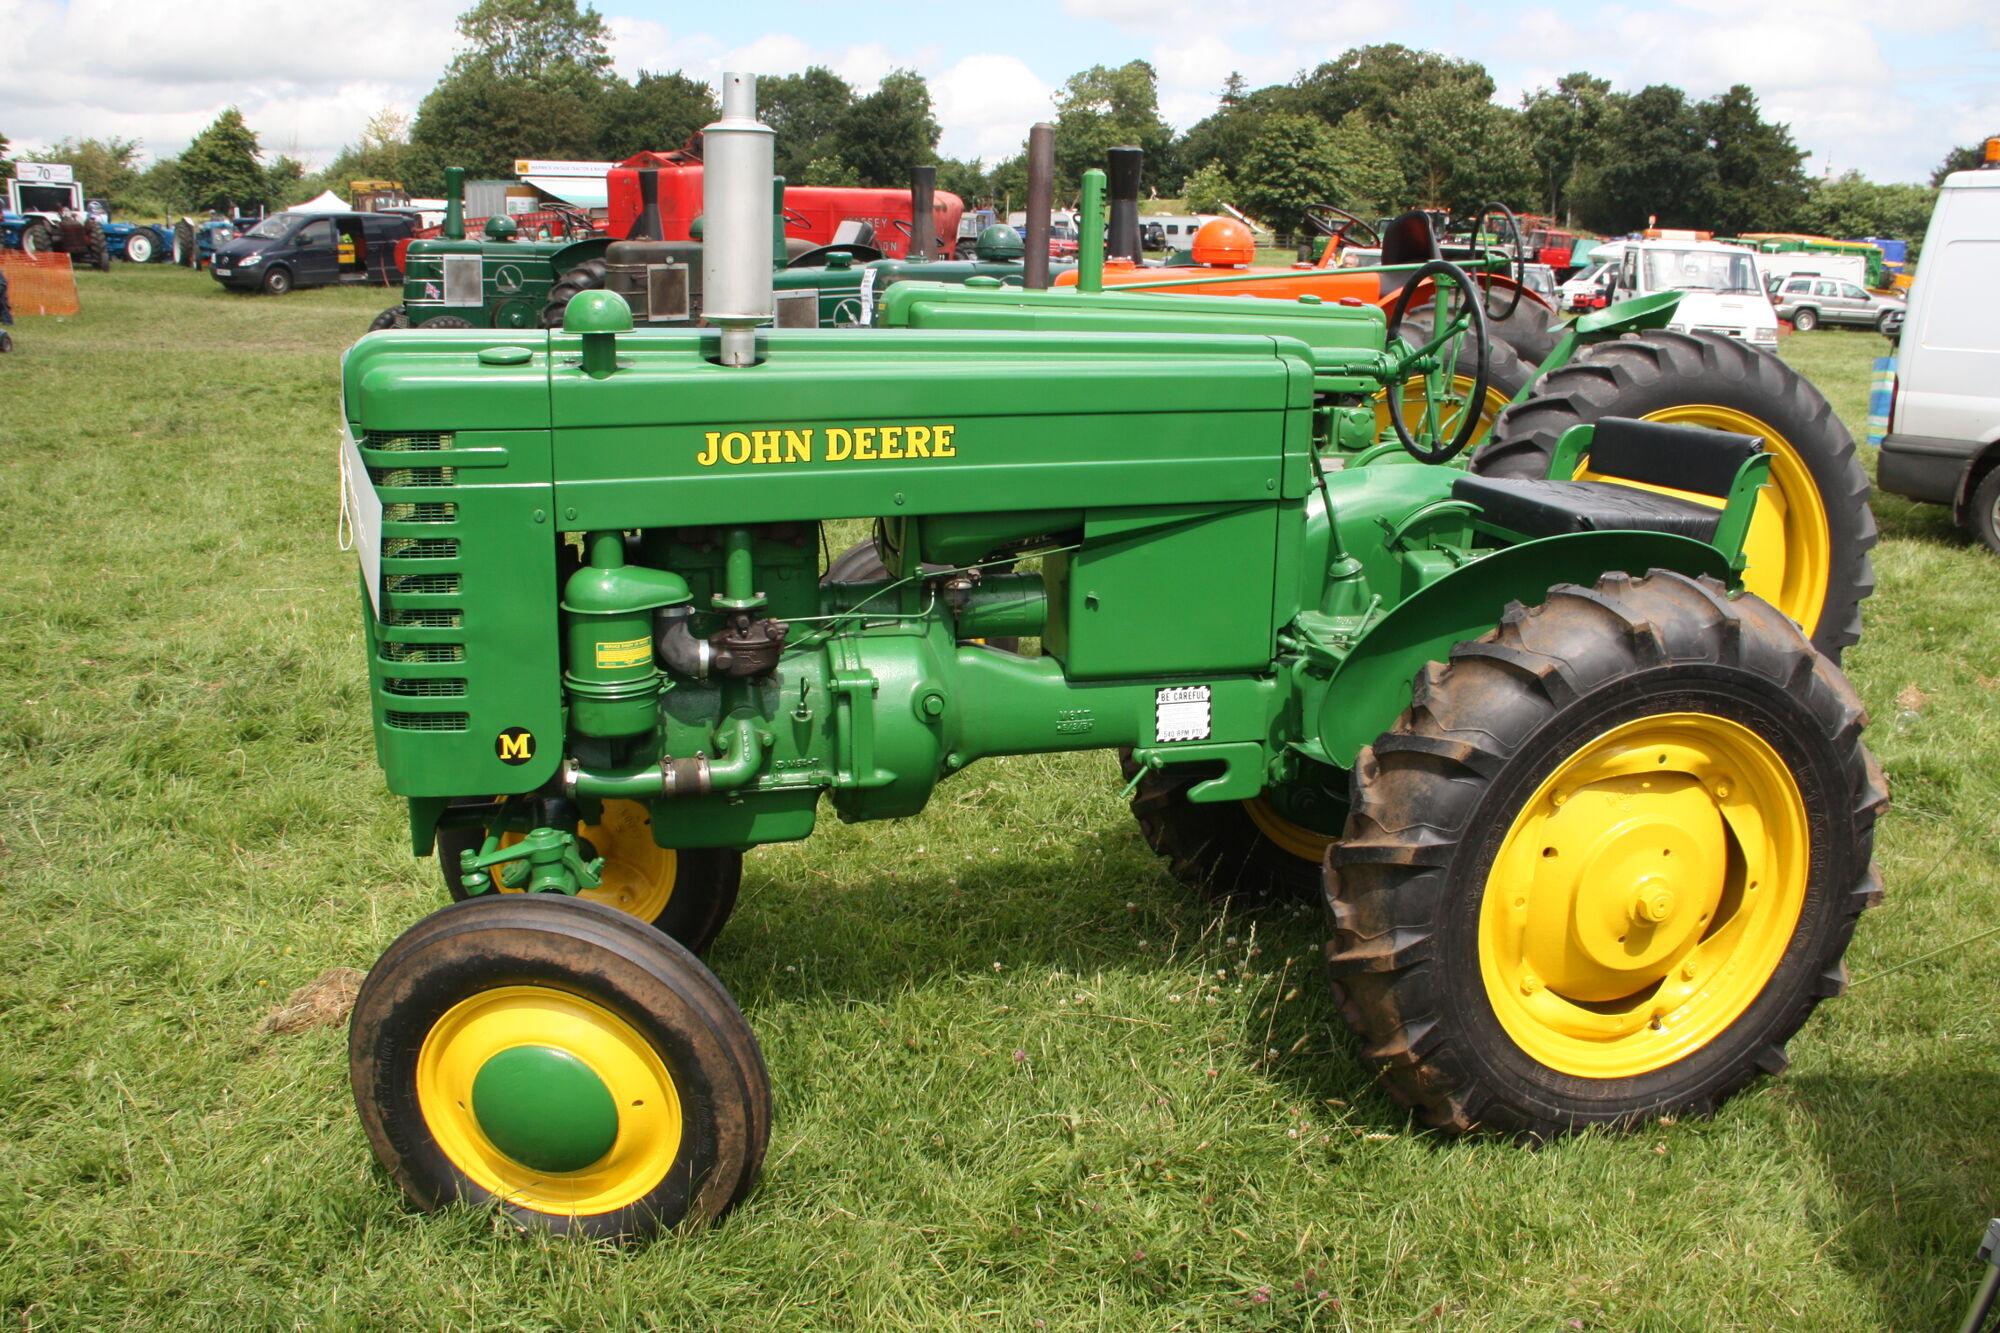 john deere model m | tractor & construction plant wiki